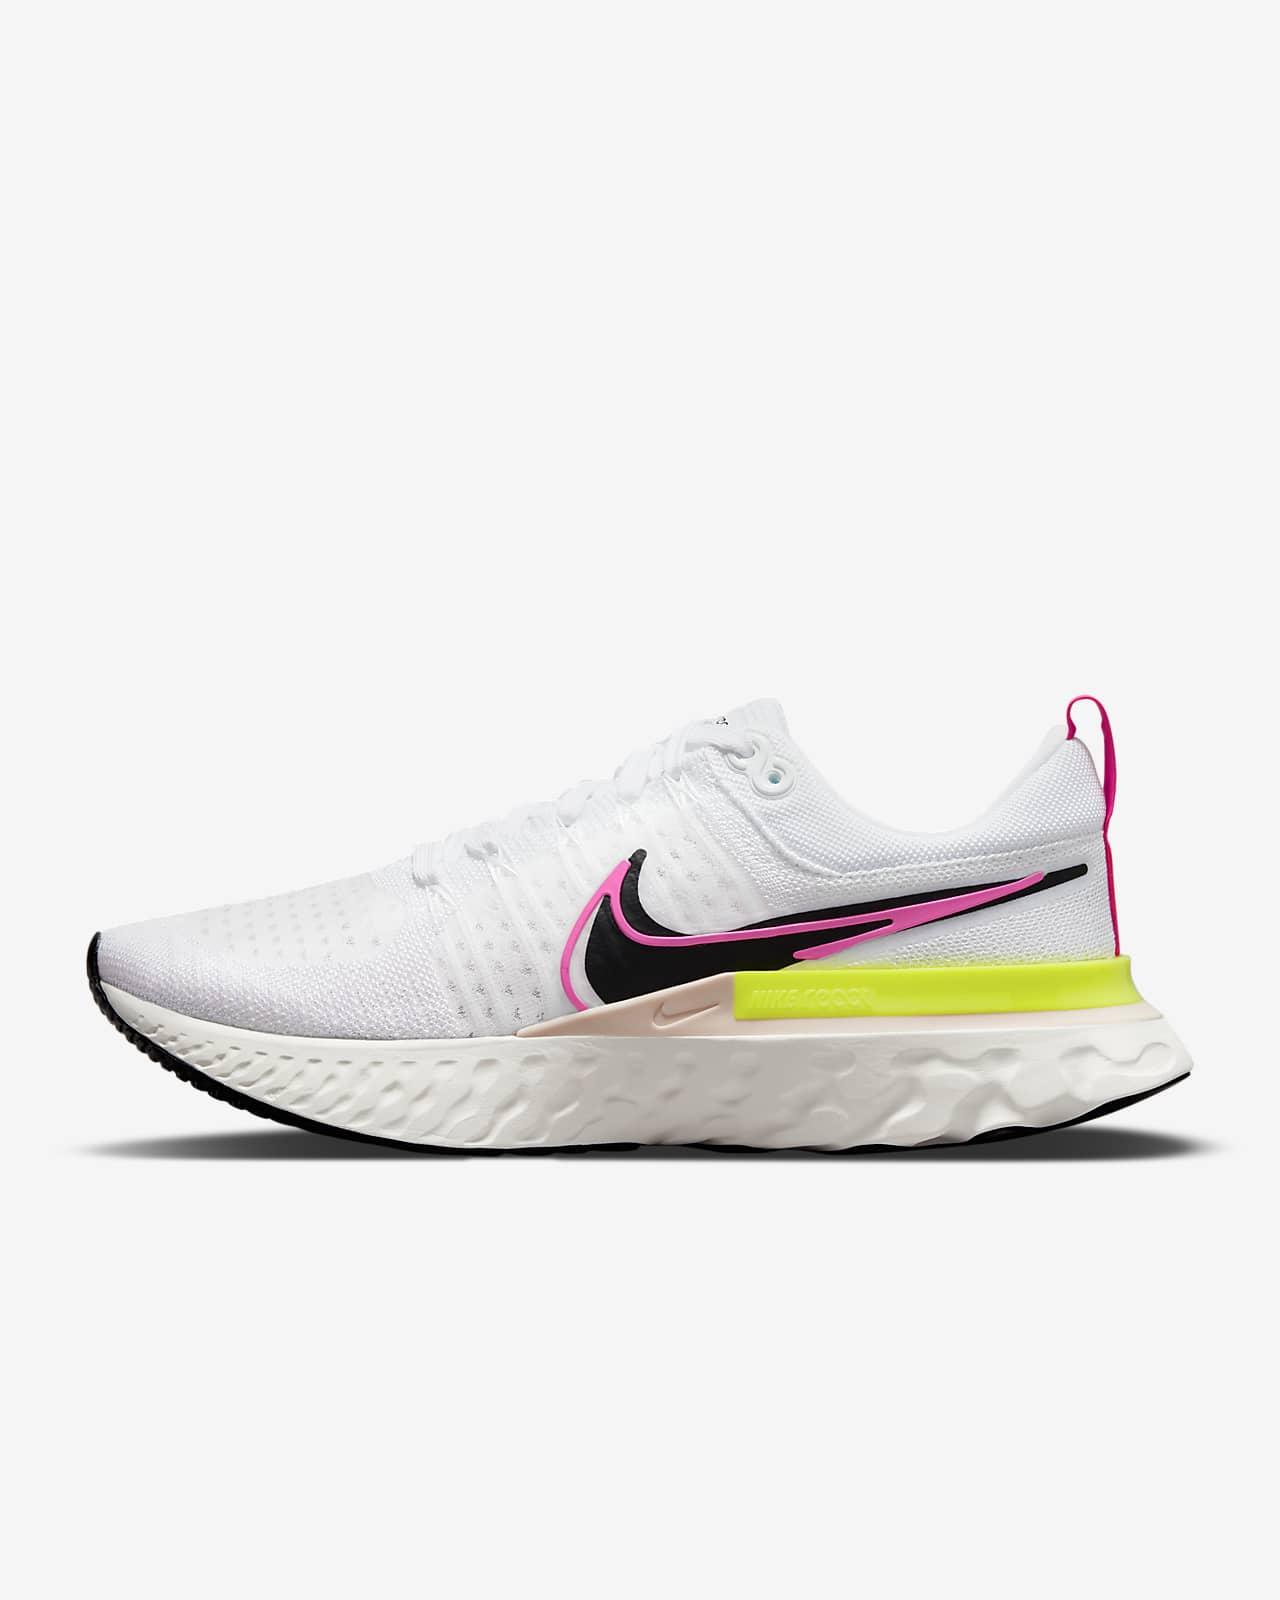 Scarpa da running Nike React Infinity Run Flyknit 2 - Uomo